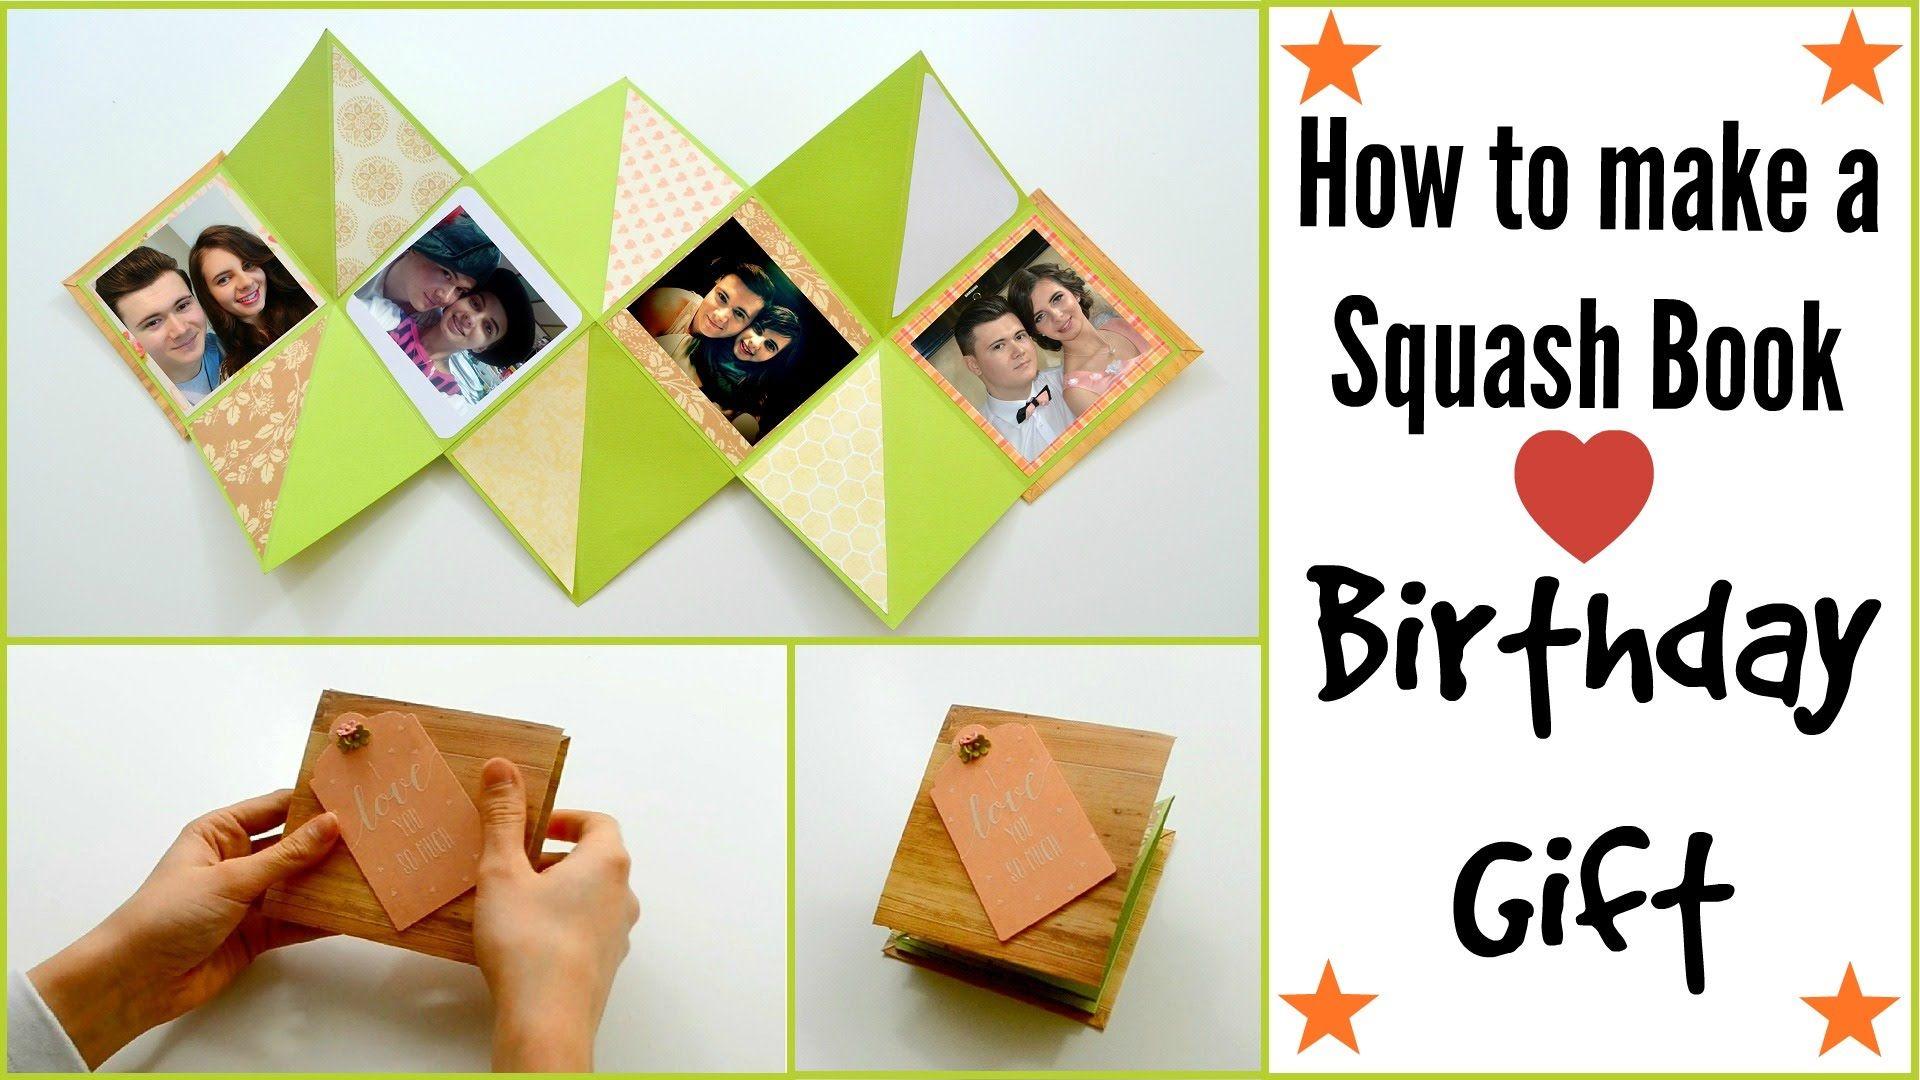 Diy paper crafts how to make a squash card squash book craft jeuxipadfo Images